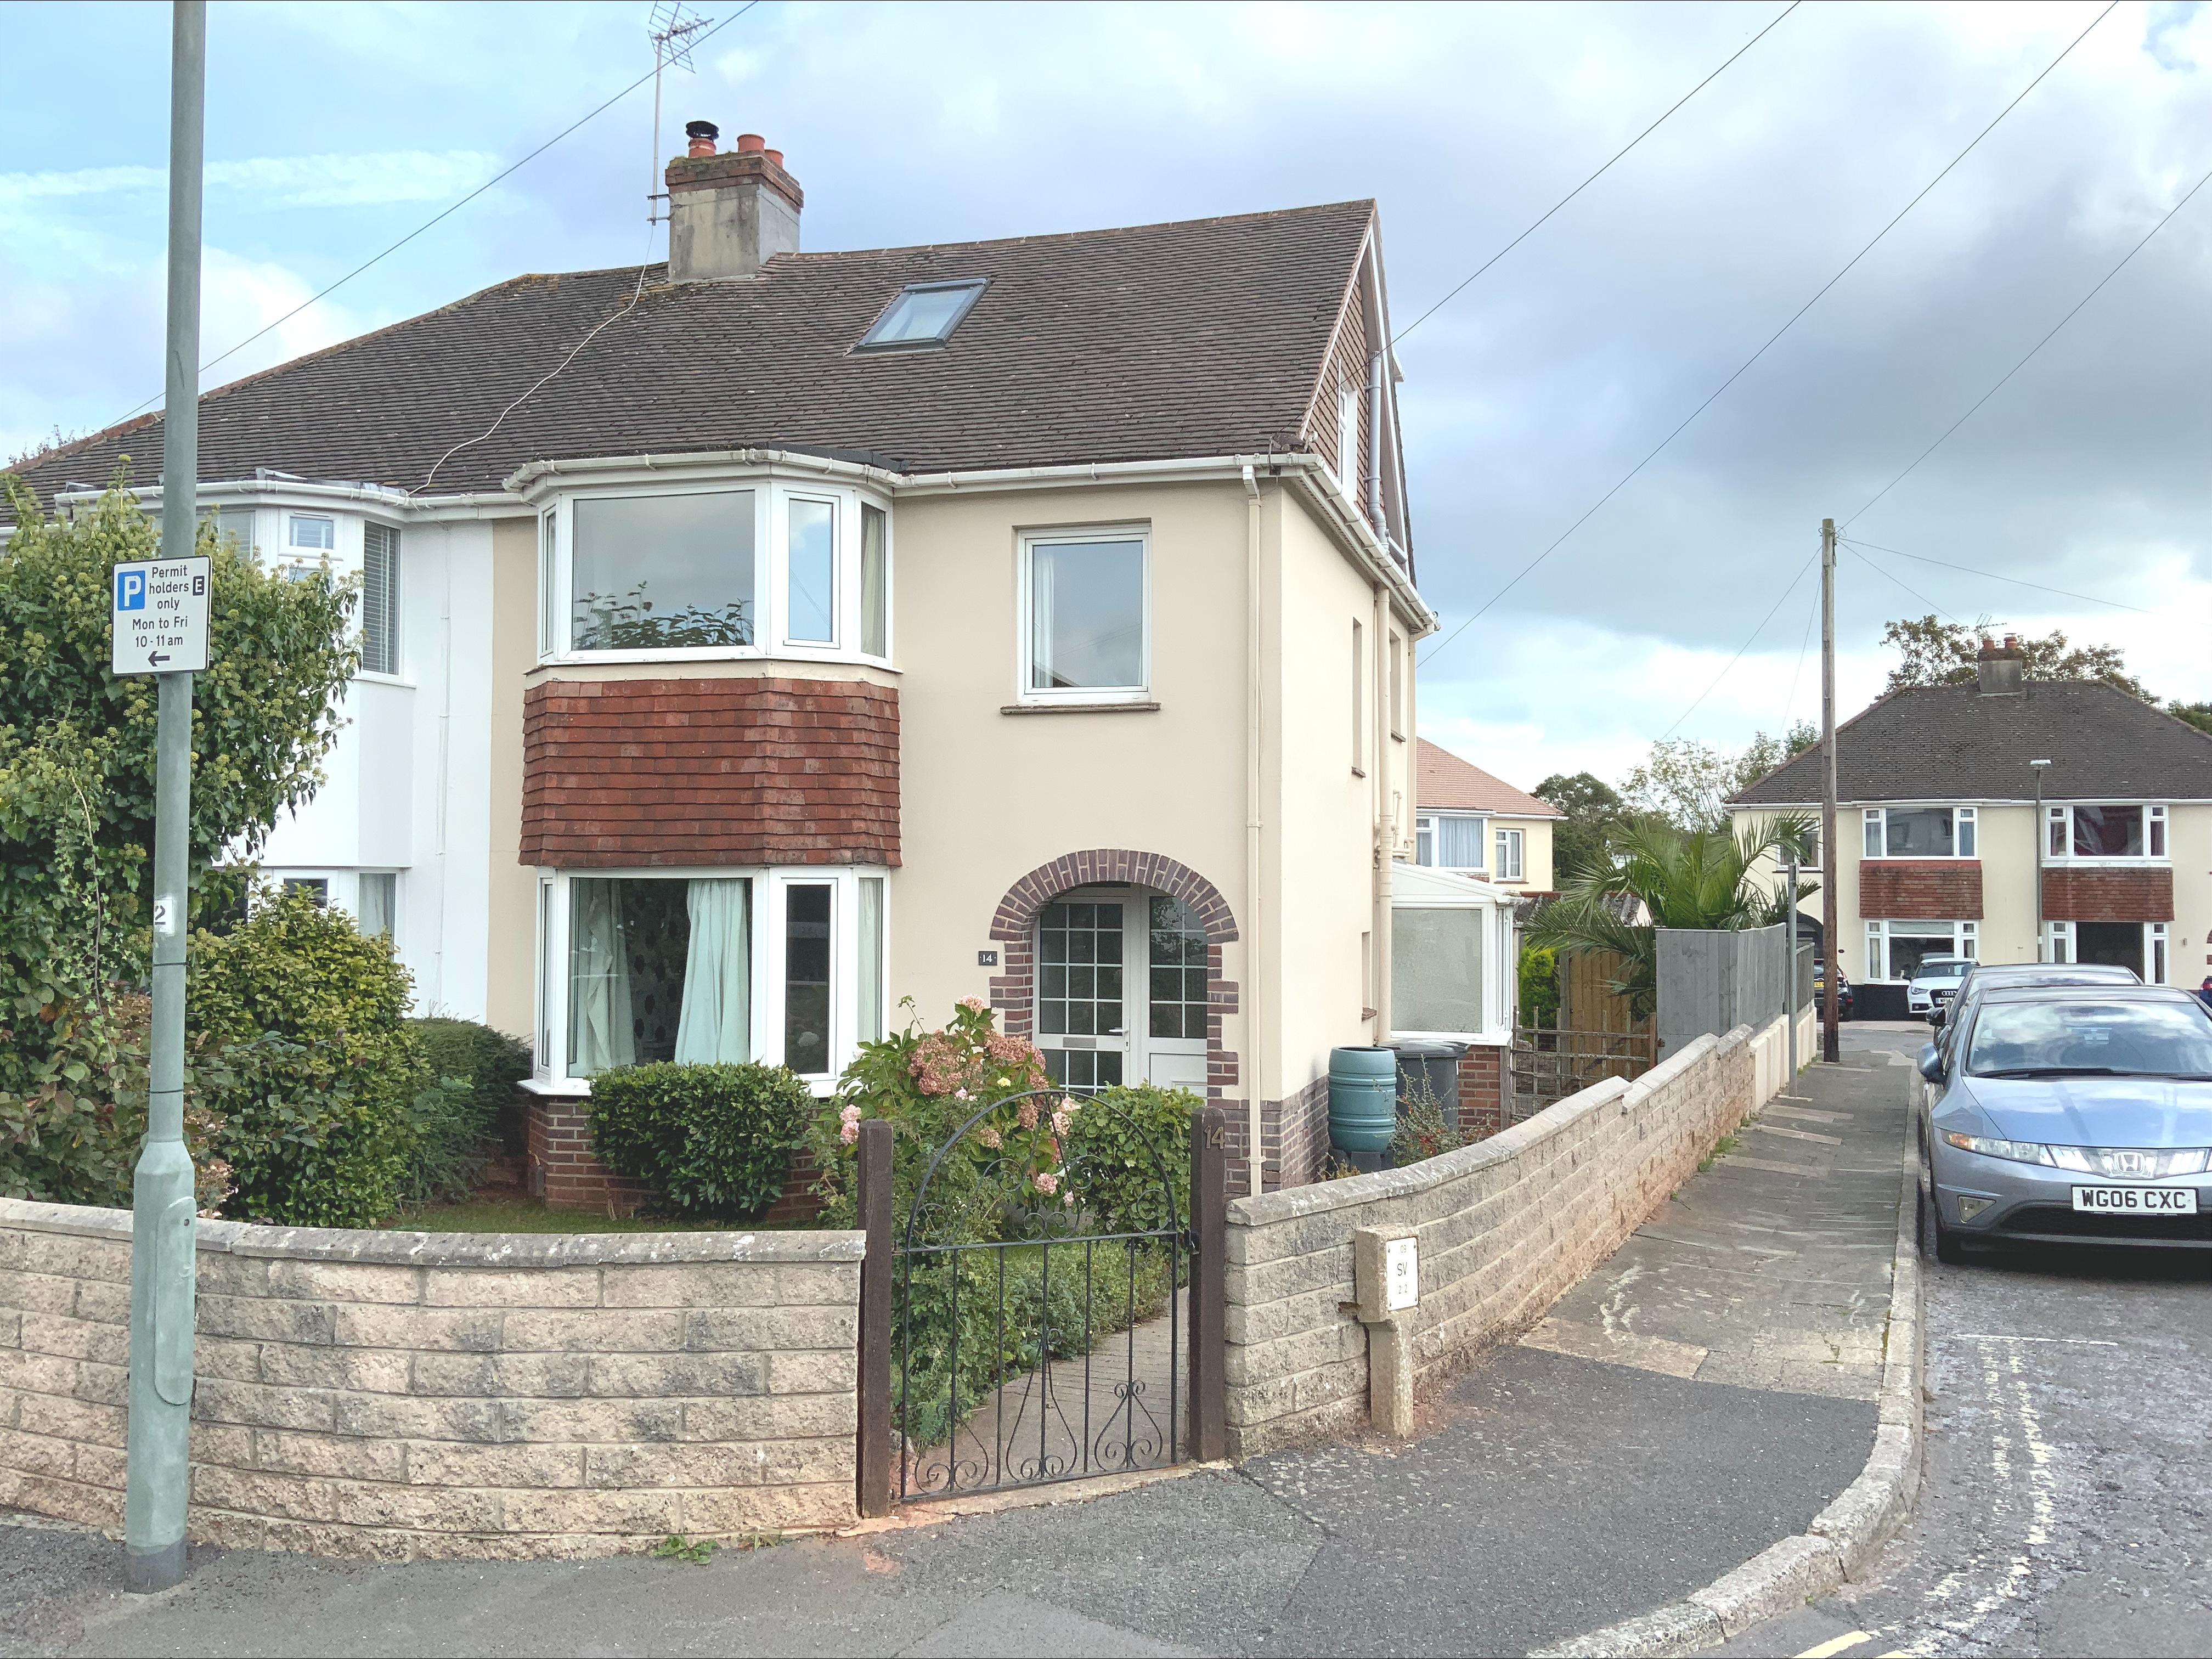 Cadewell Crescent, Shiphay, Torquay